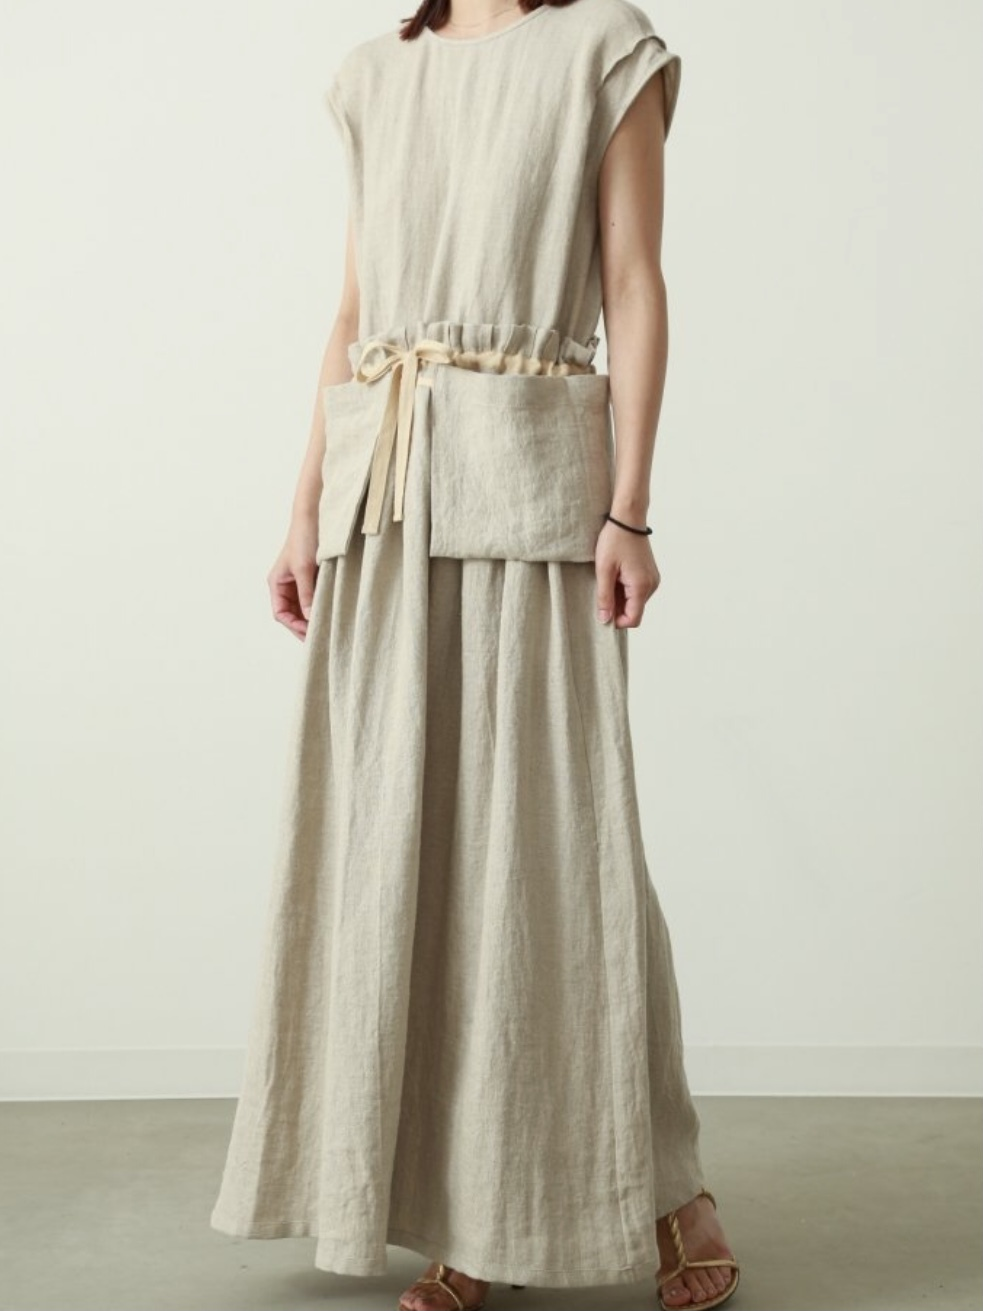 【VillD】HERRINGBONE LINEN DRESS